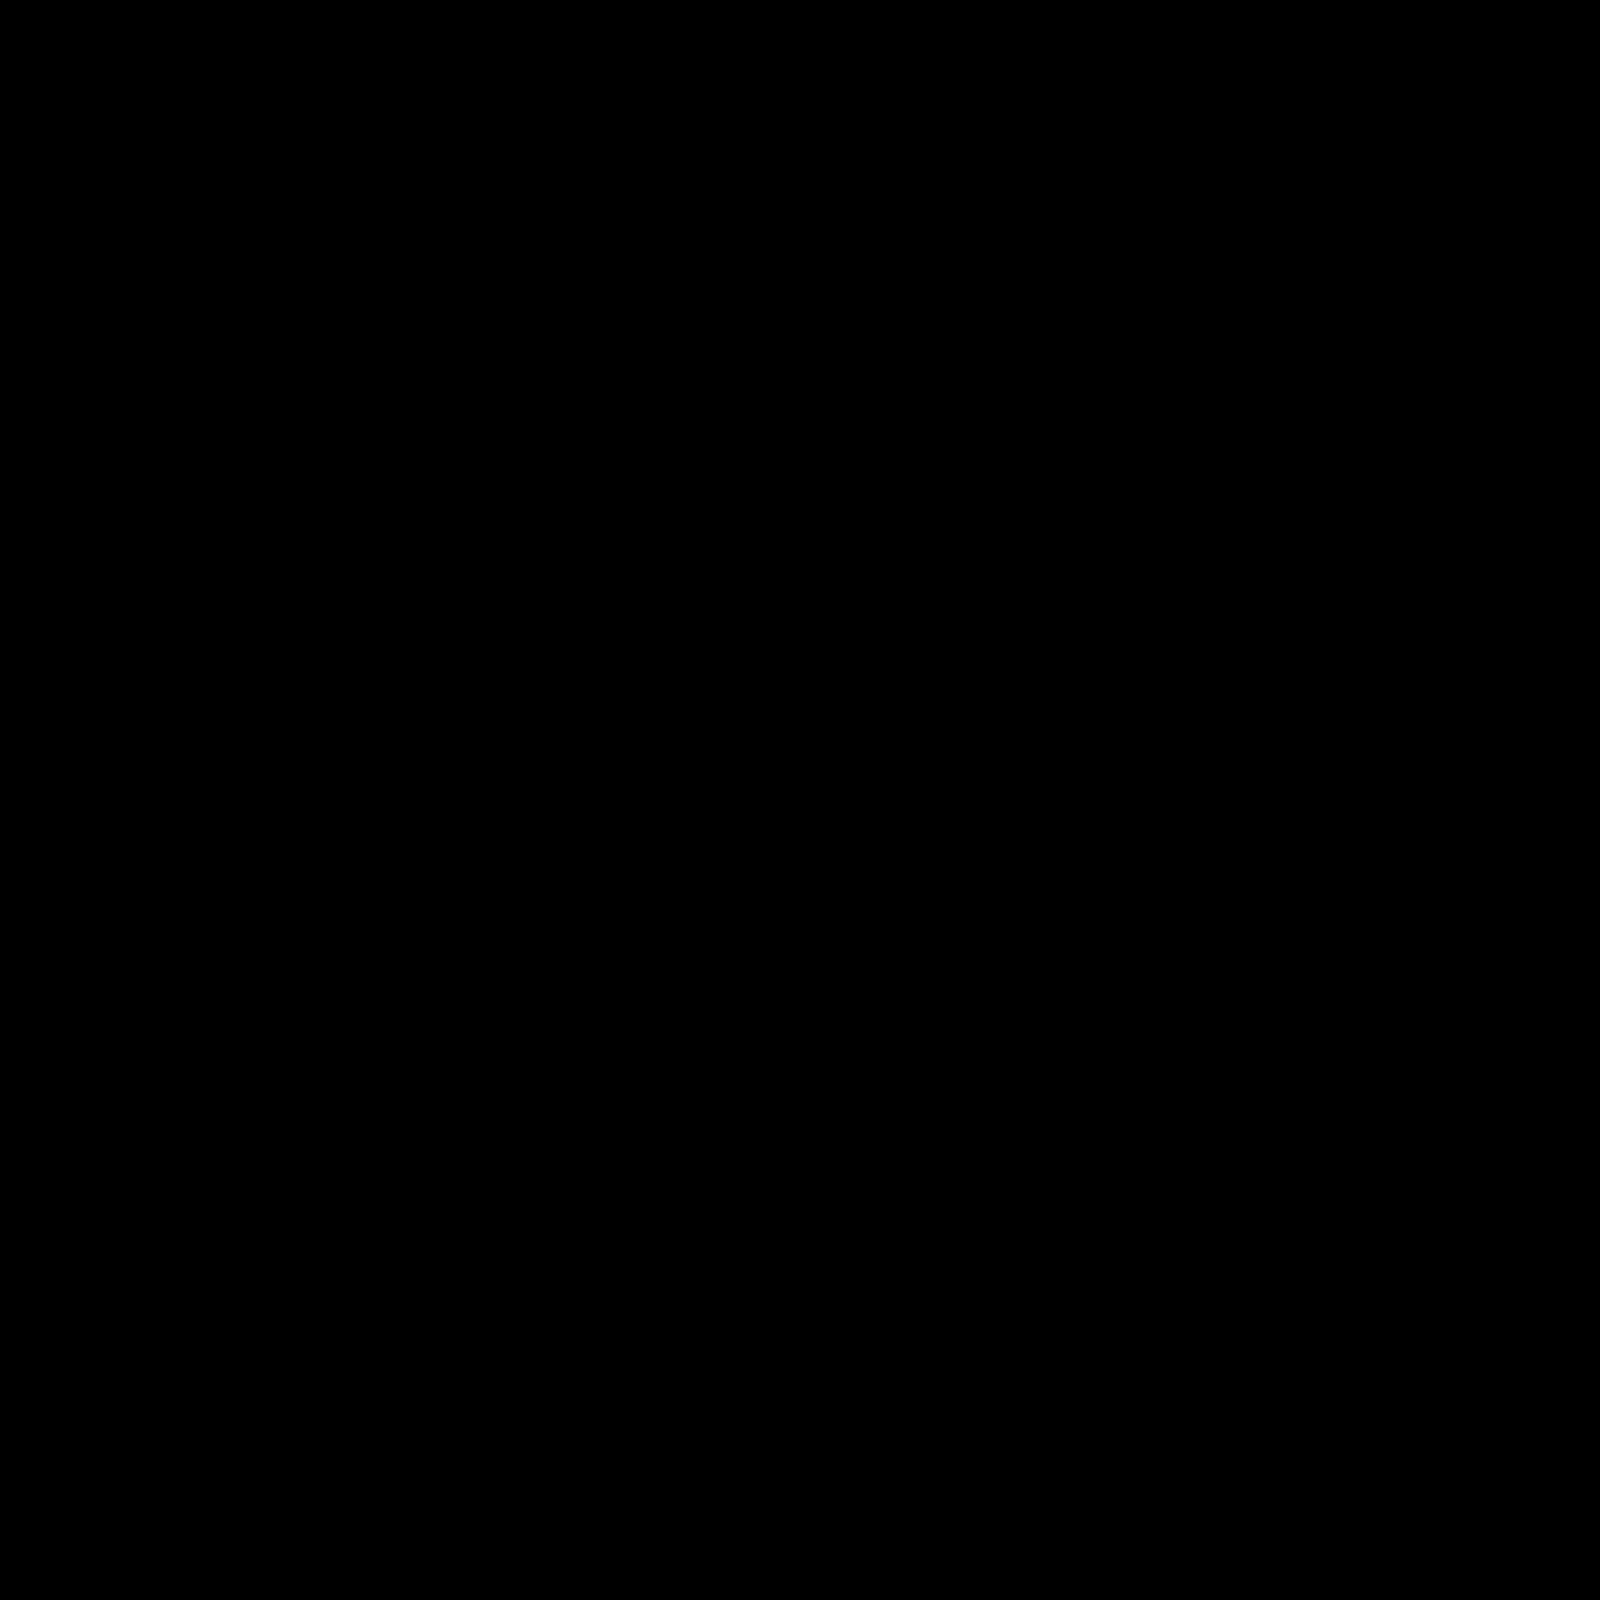 Vaporetto icon